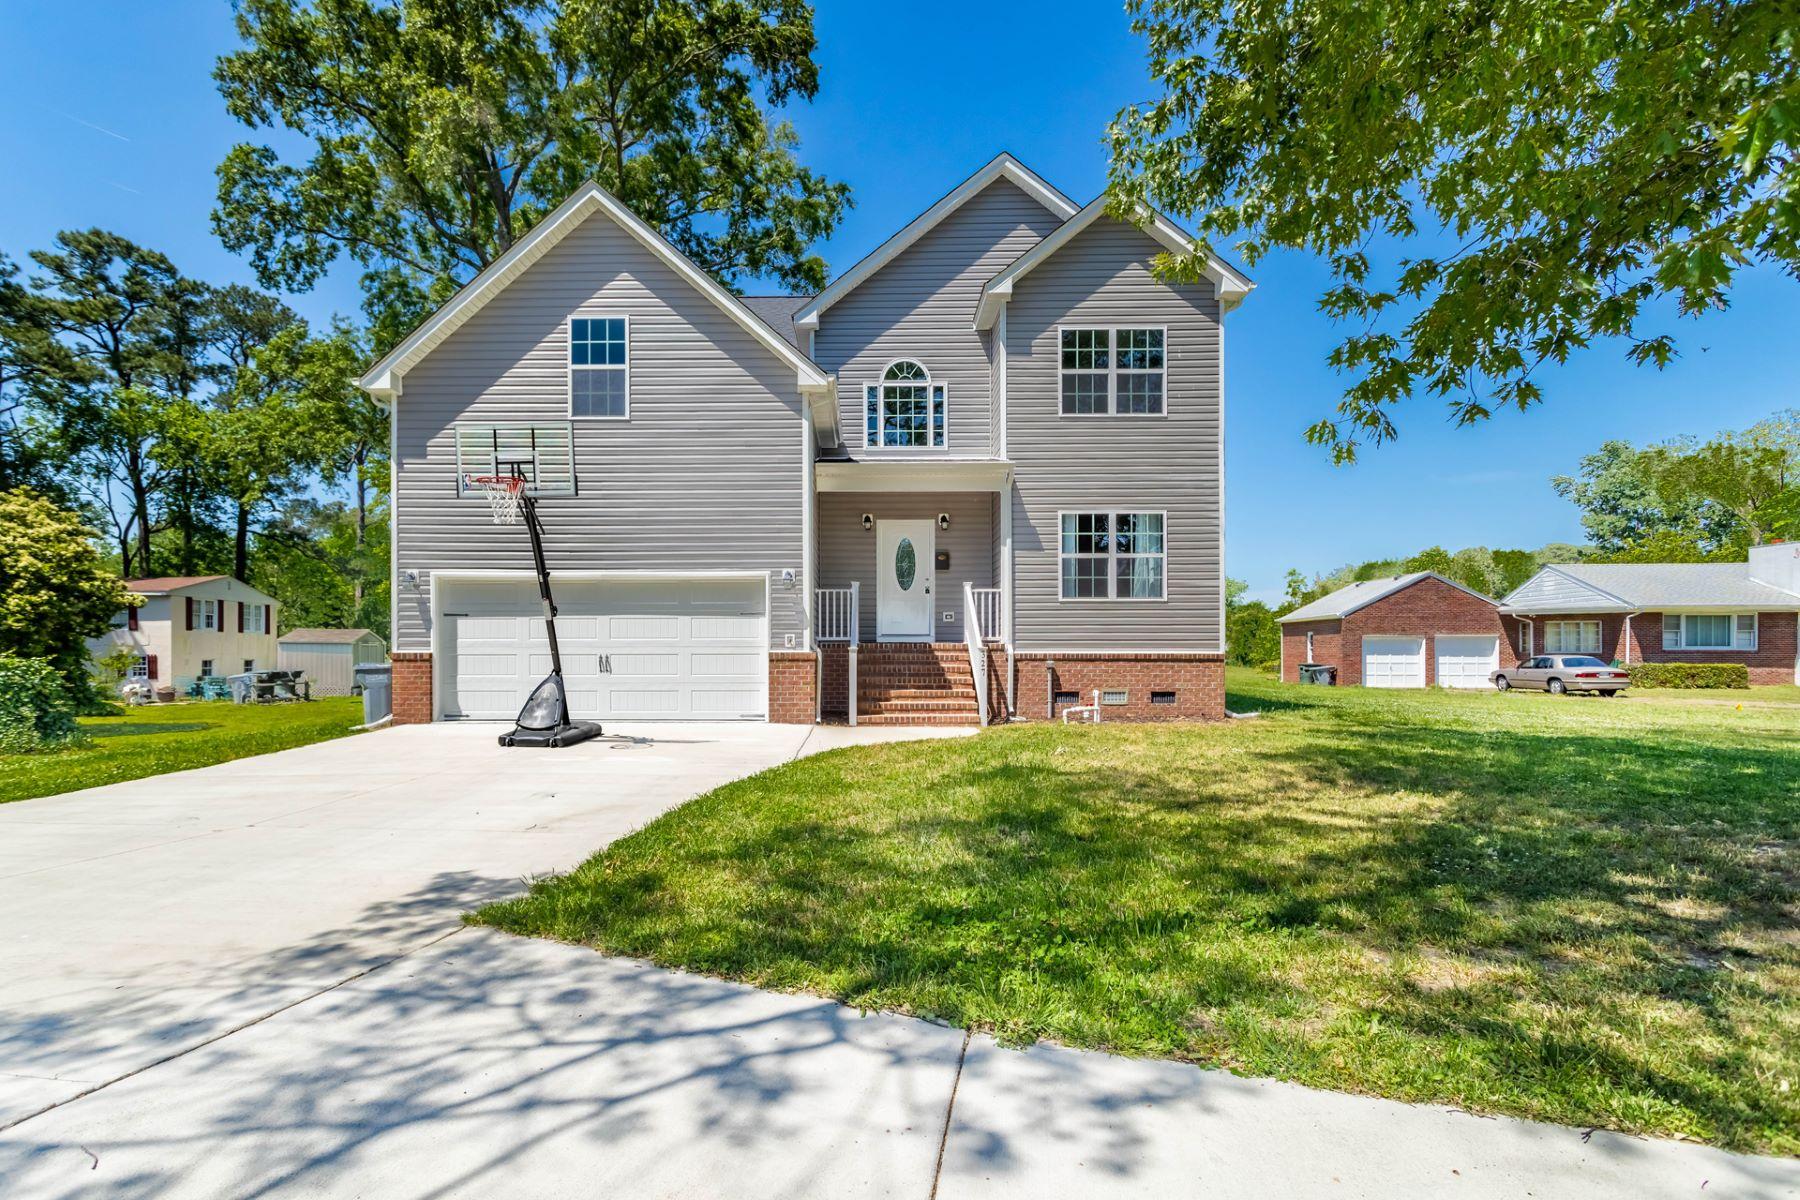 Single Family Homes のために 売買 アット Hampton Langley 327 Fox Hill Road, Hampton, バージニア 23669 アメリカ